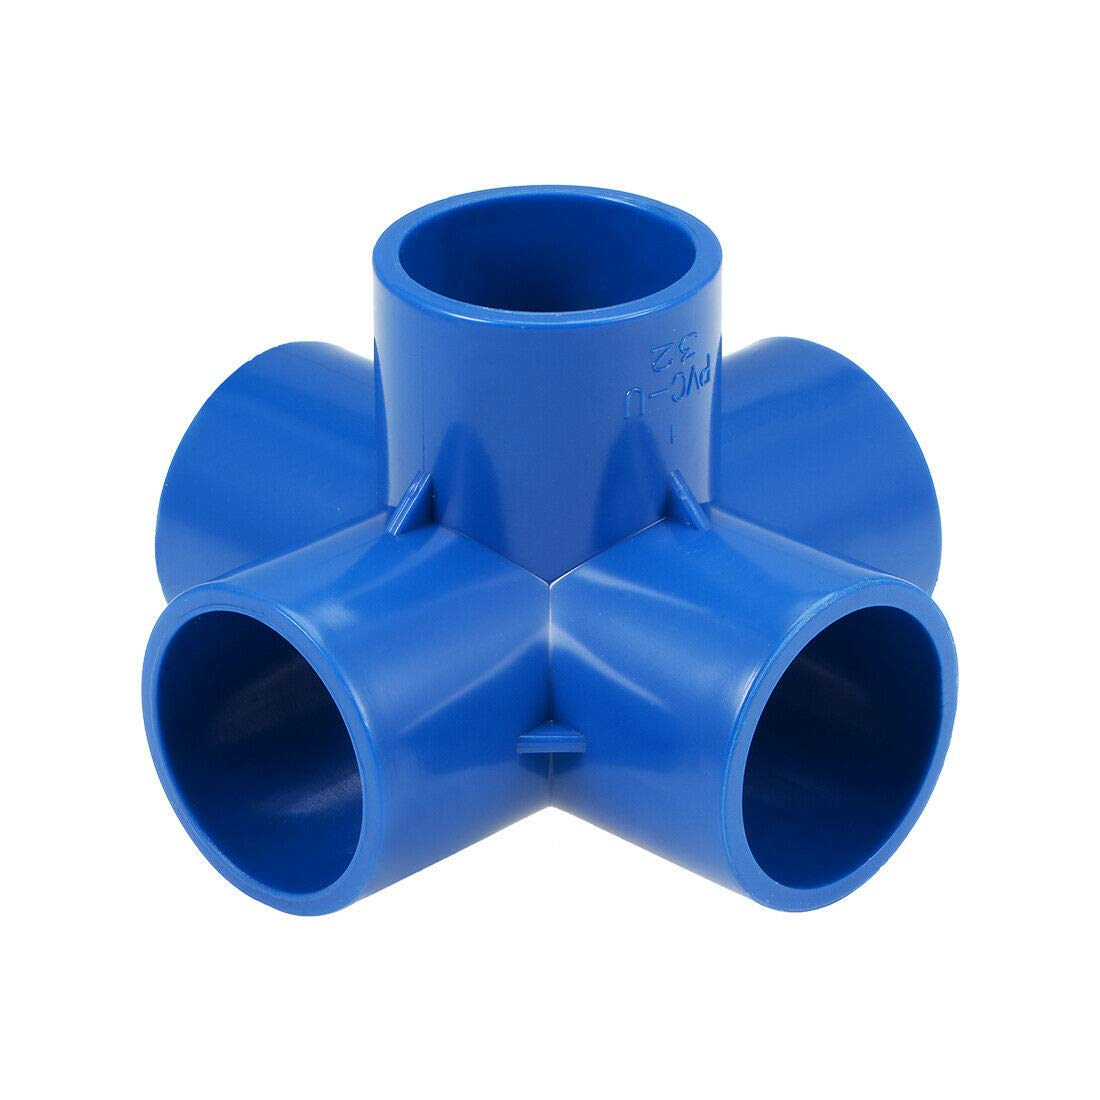 Pipe Fittings 5-Way Elbow PVC Fitting 50mm Socket Tee Corner F New 35% OFF sales